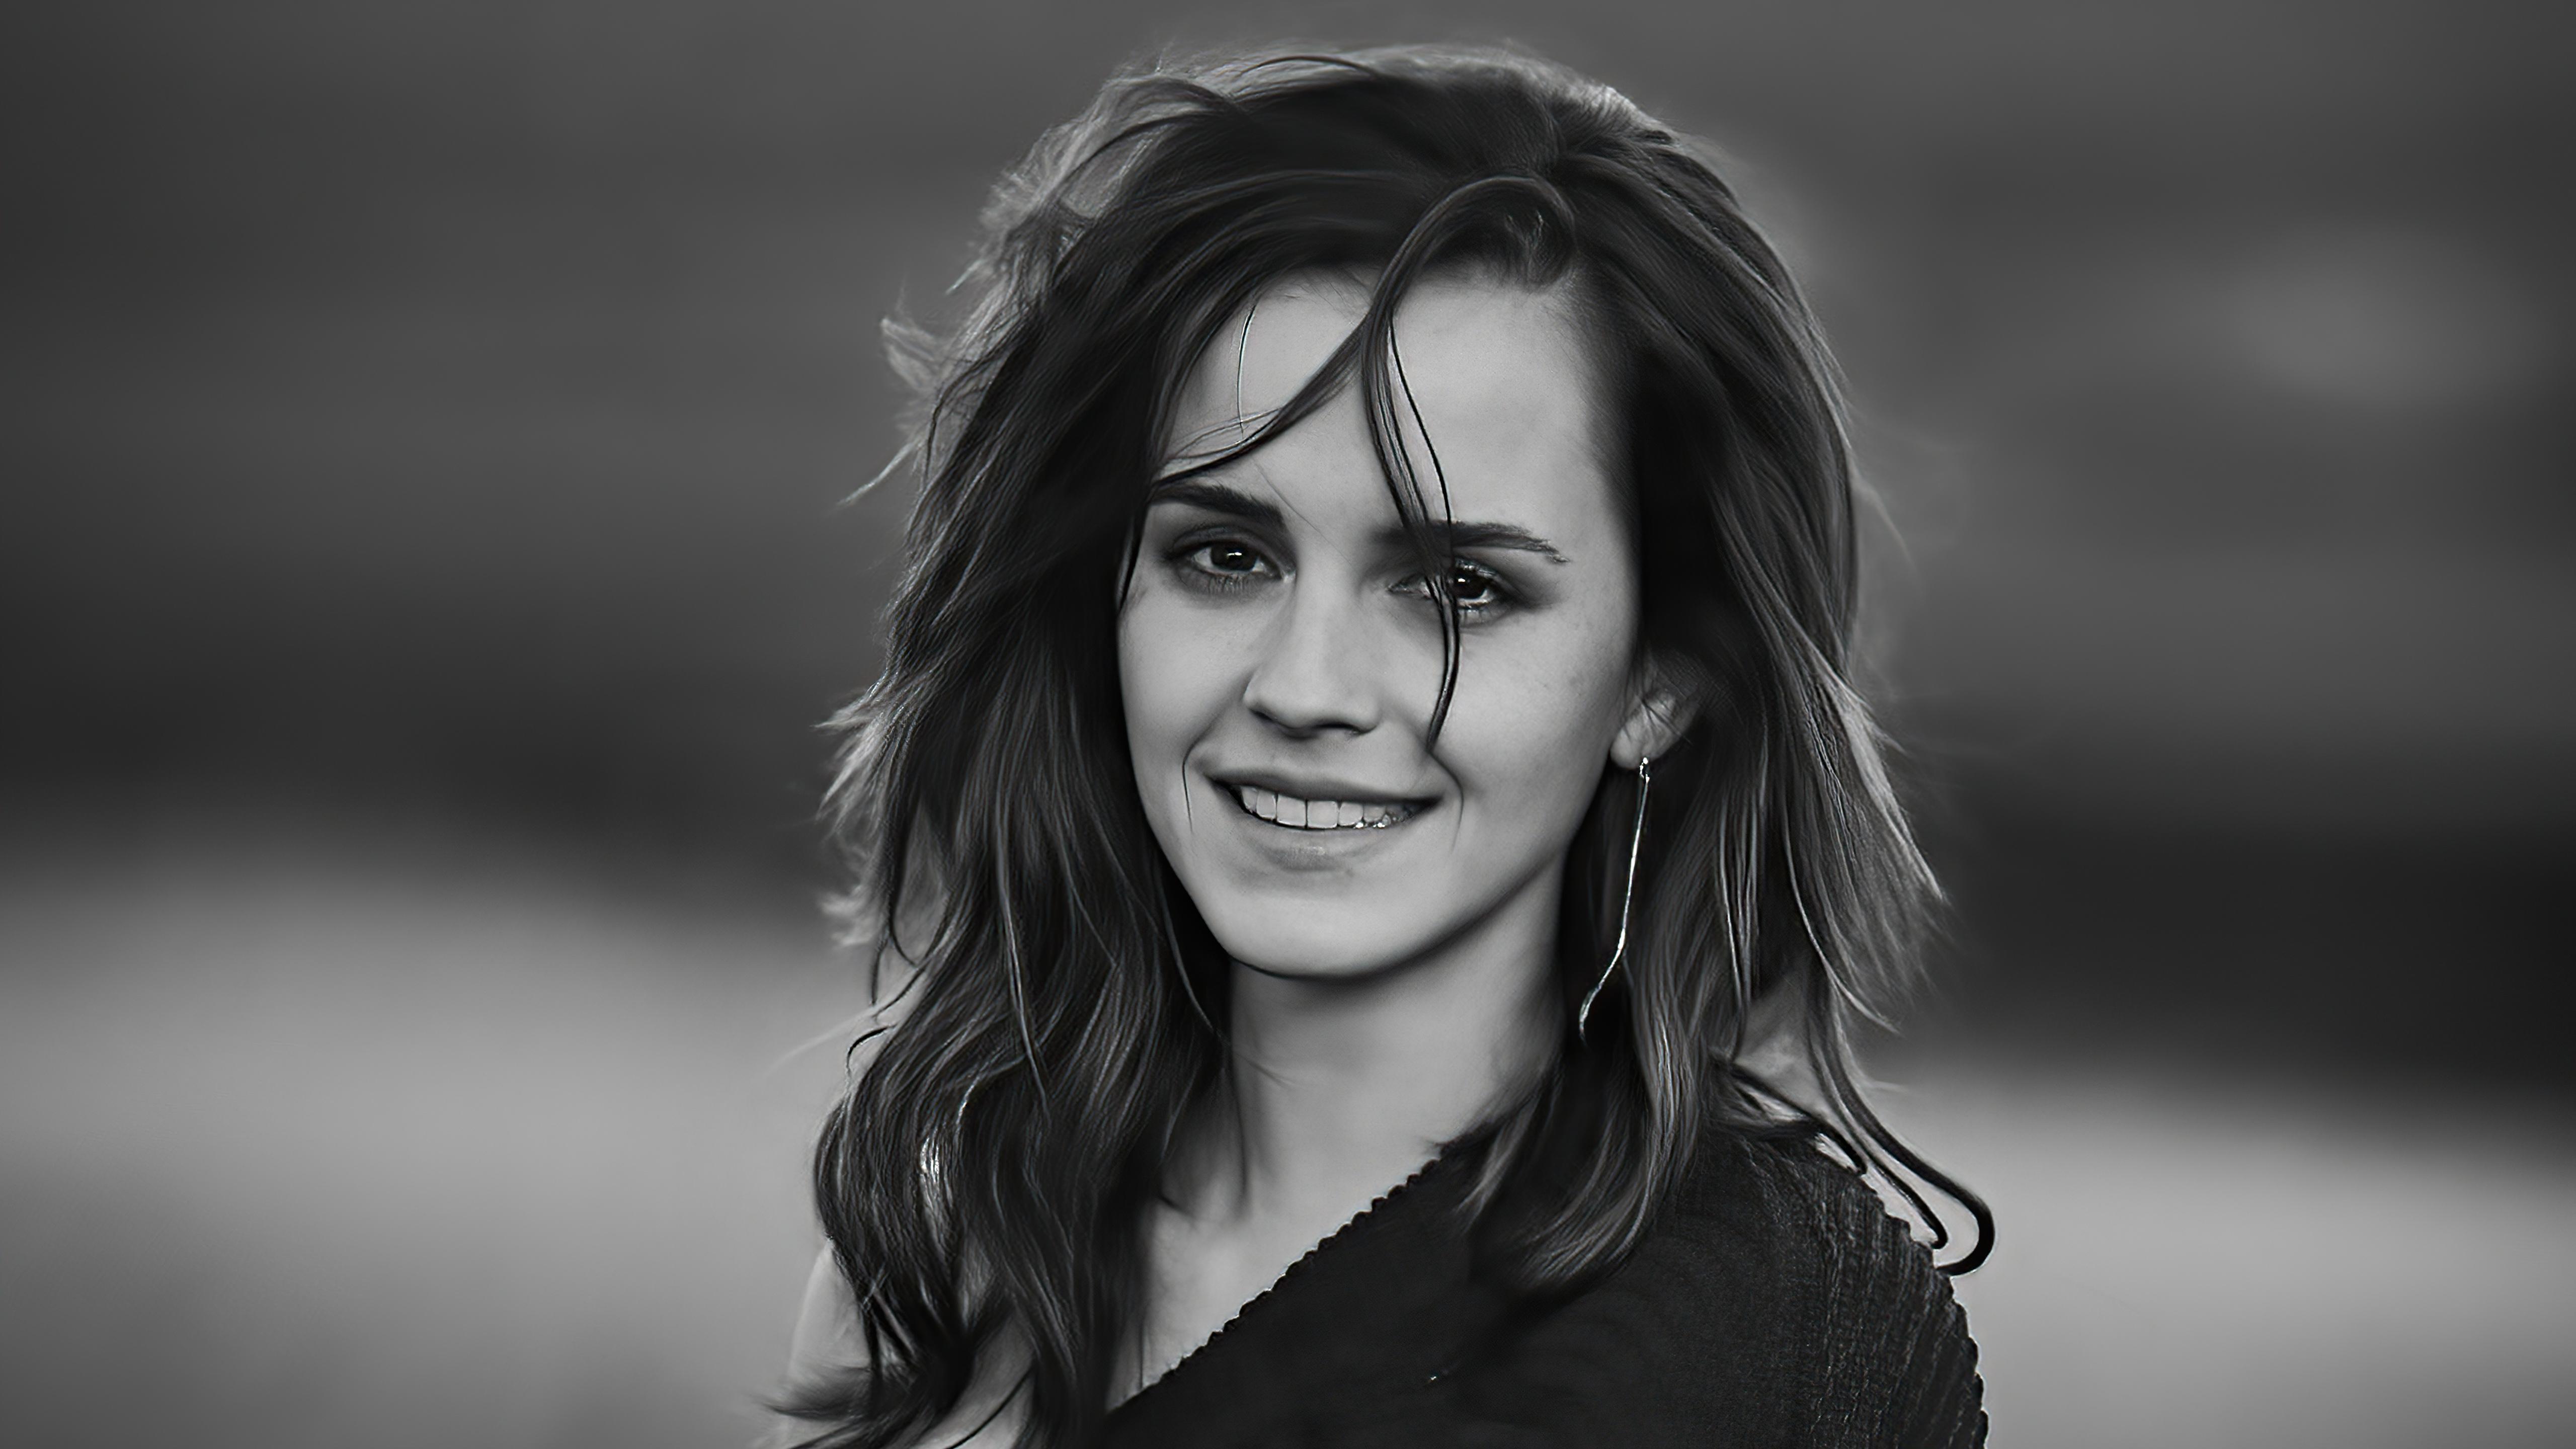 Wallpaper Emma Watson Monochrome